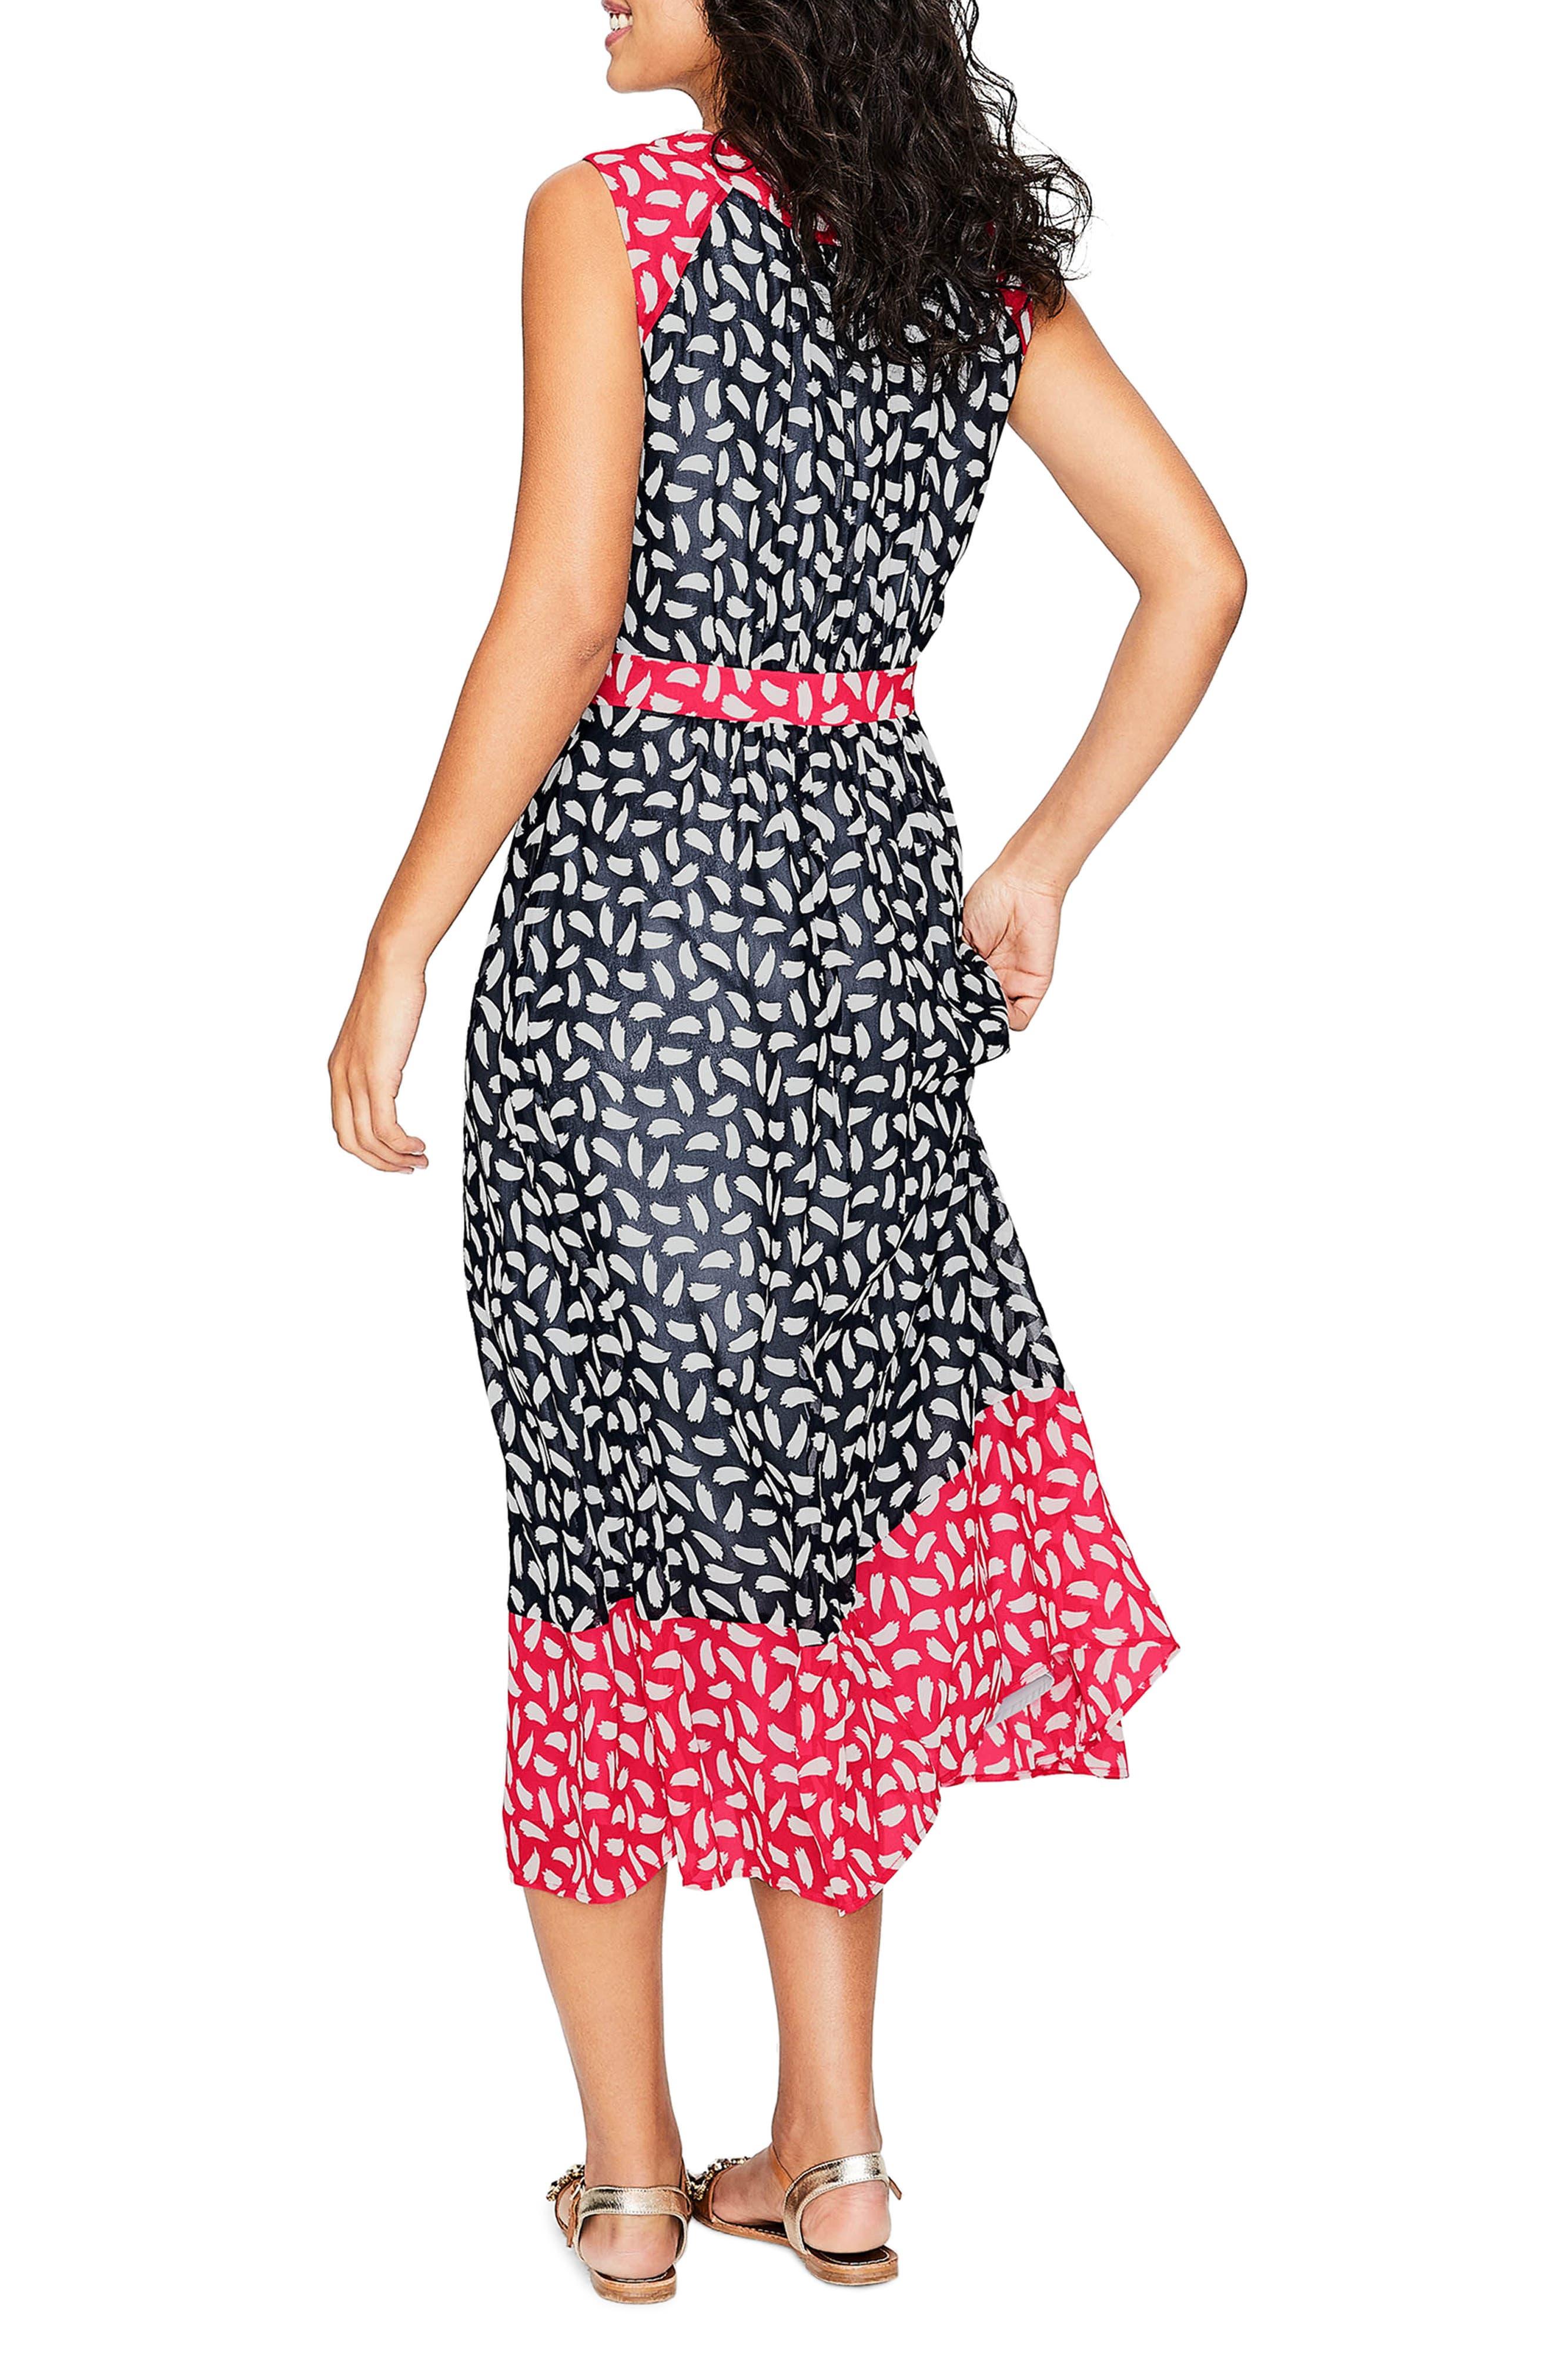 BODEN,                             Sylvie Print Sleeveless Dress,                             Alternate thumbnail 2, color,                             414